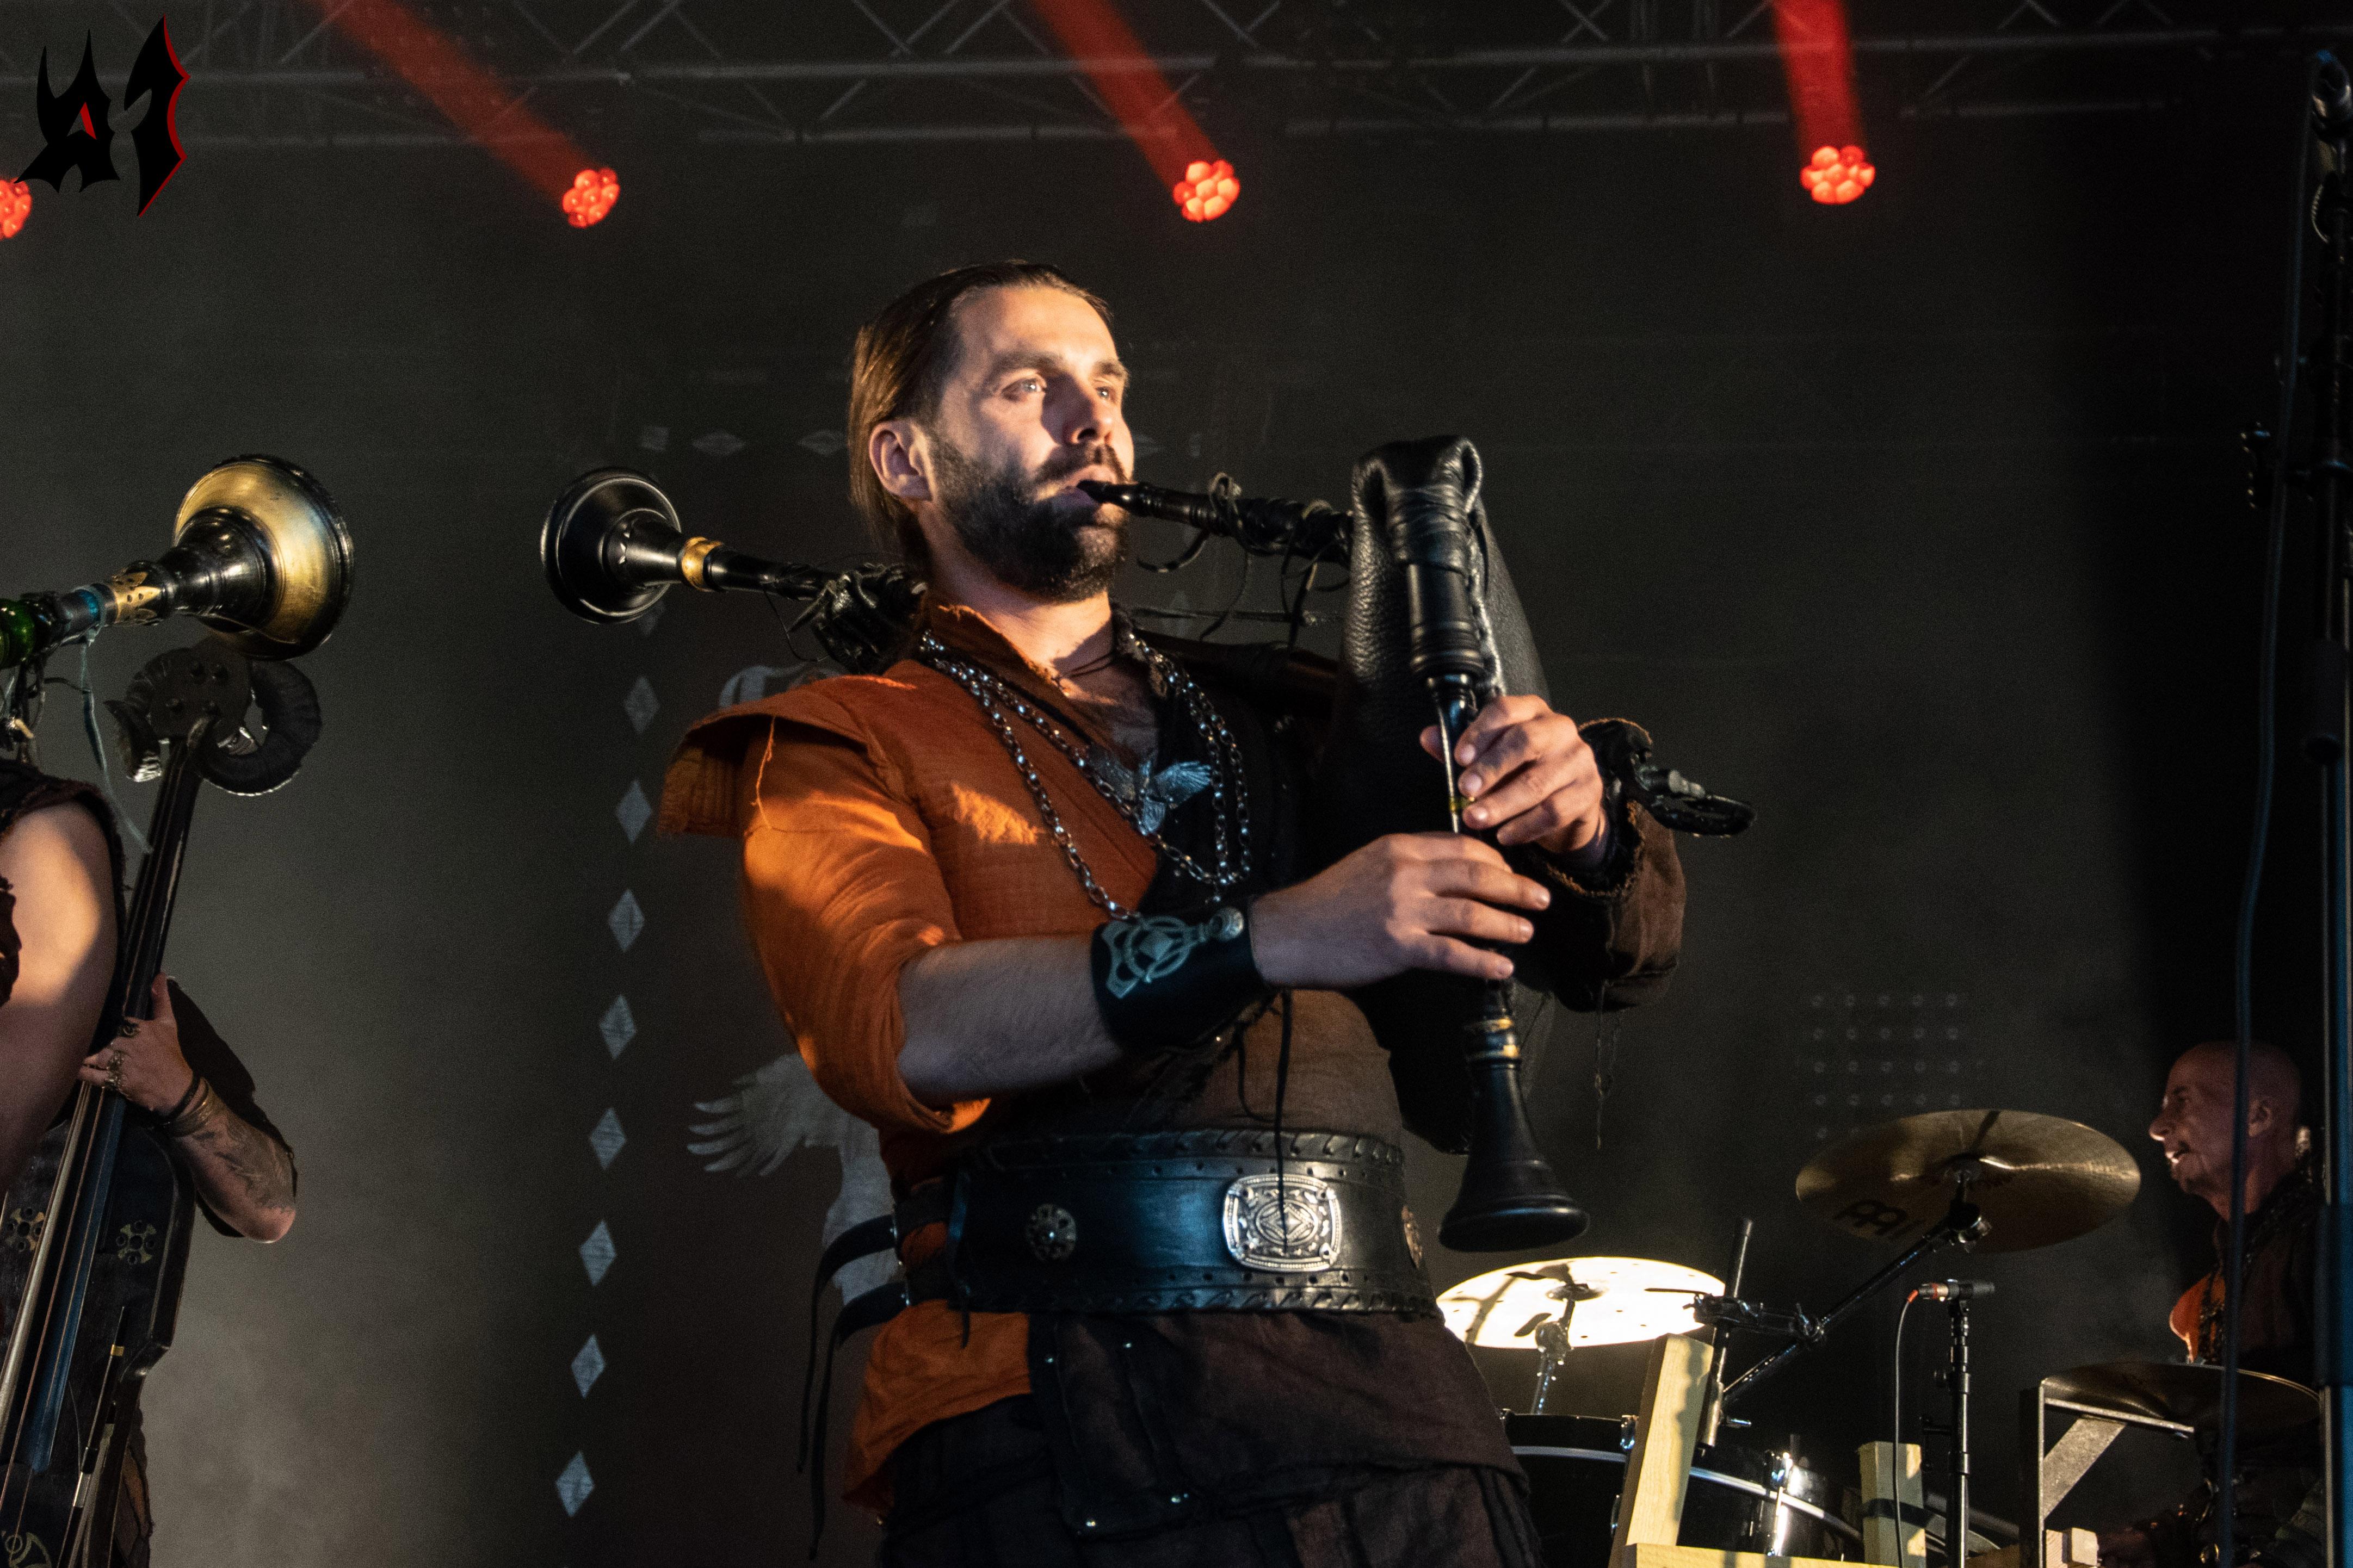 Motocultor - Corvus Corax - 14